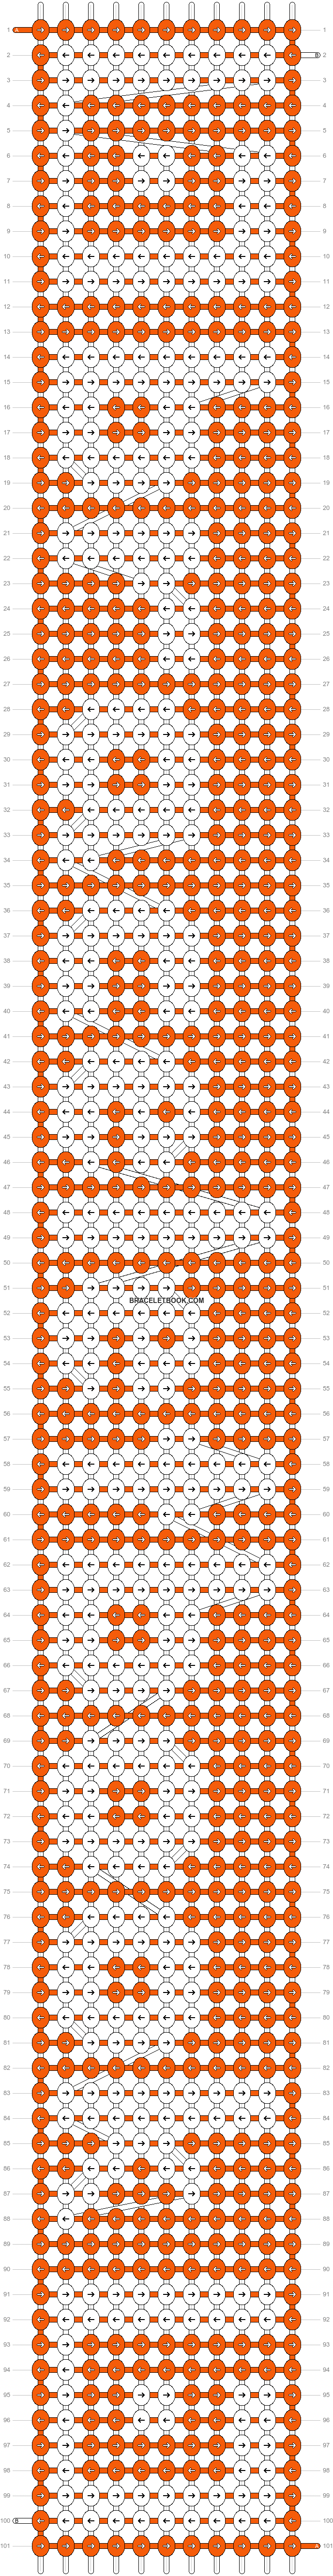 Alpha pattern #29124 pattern